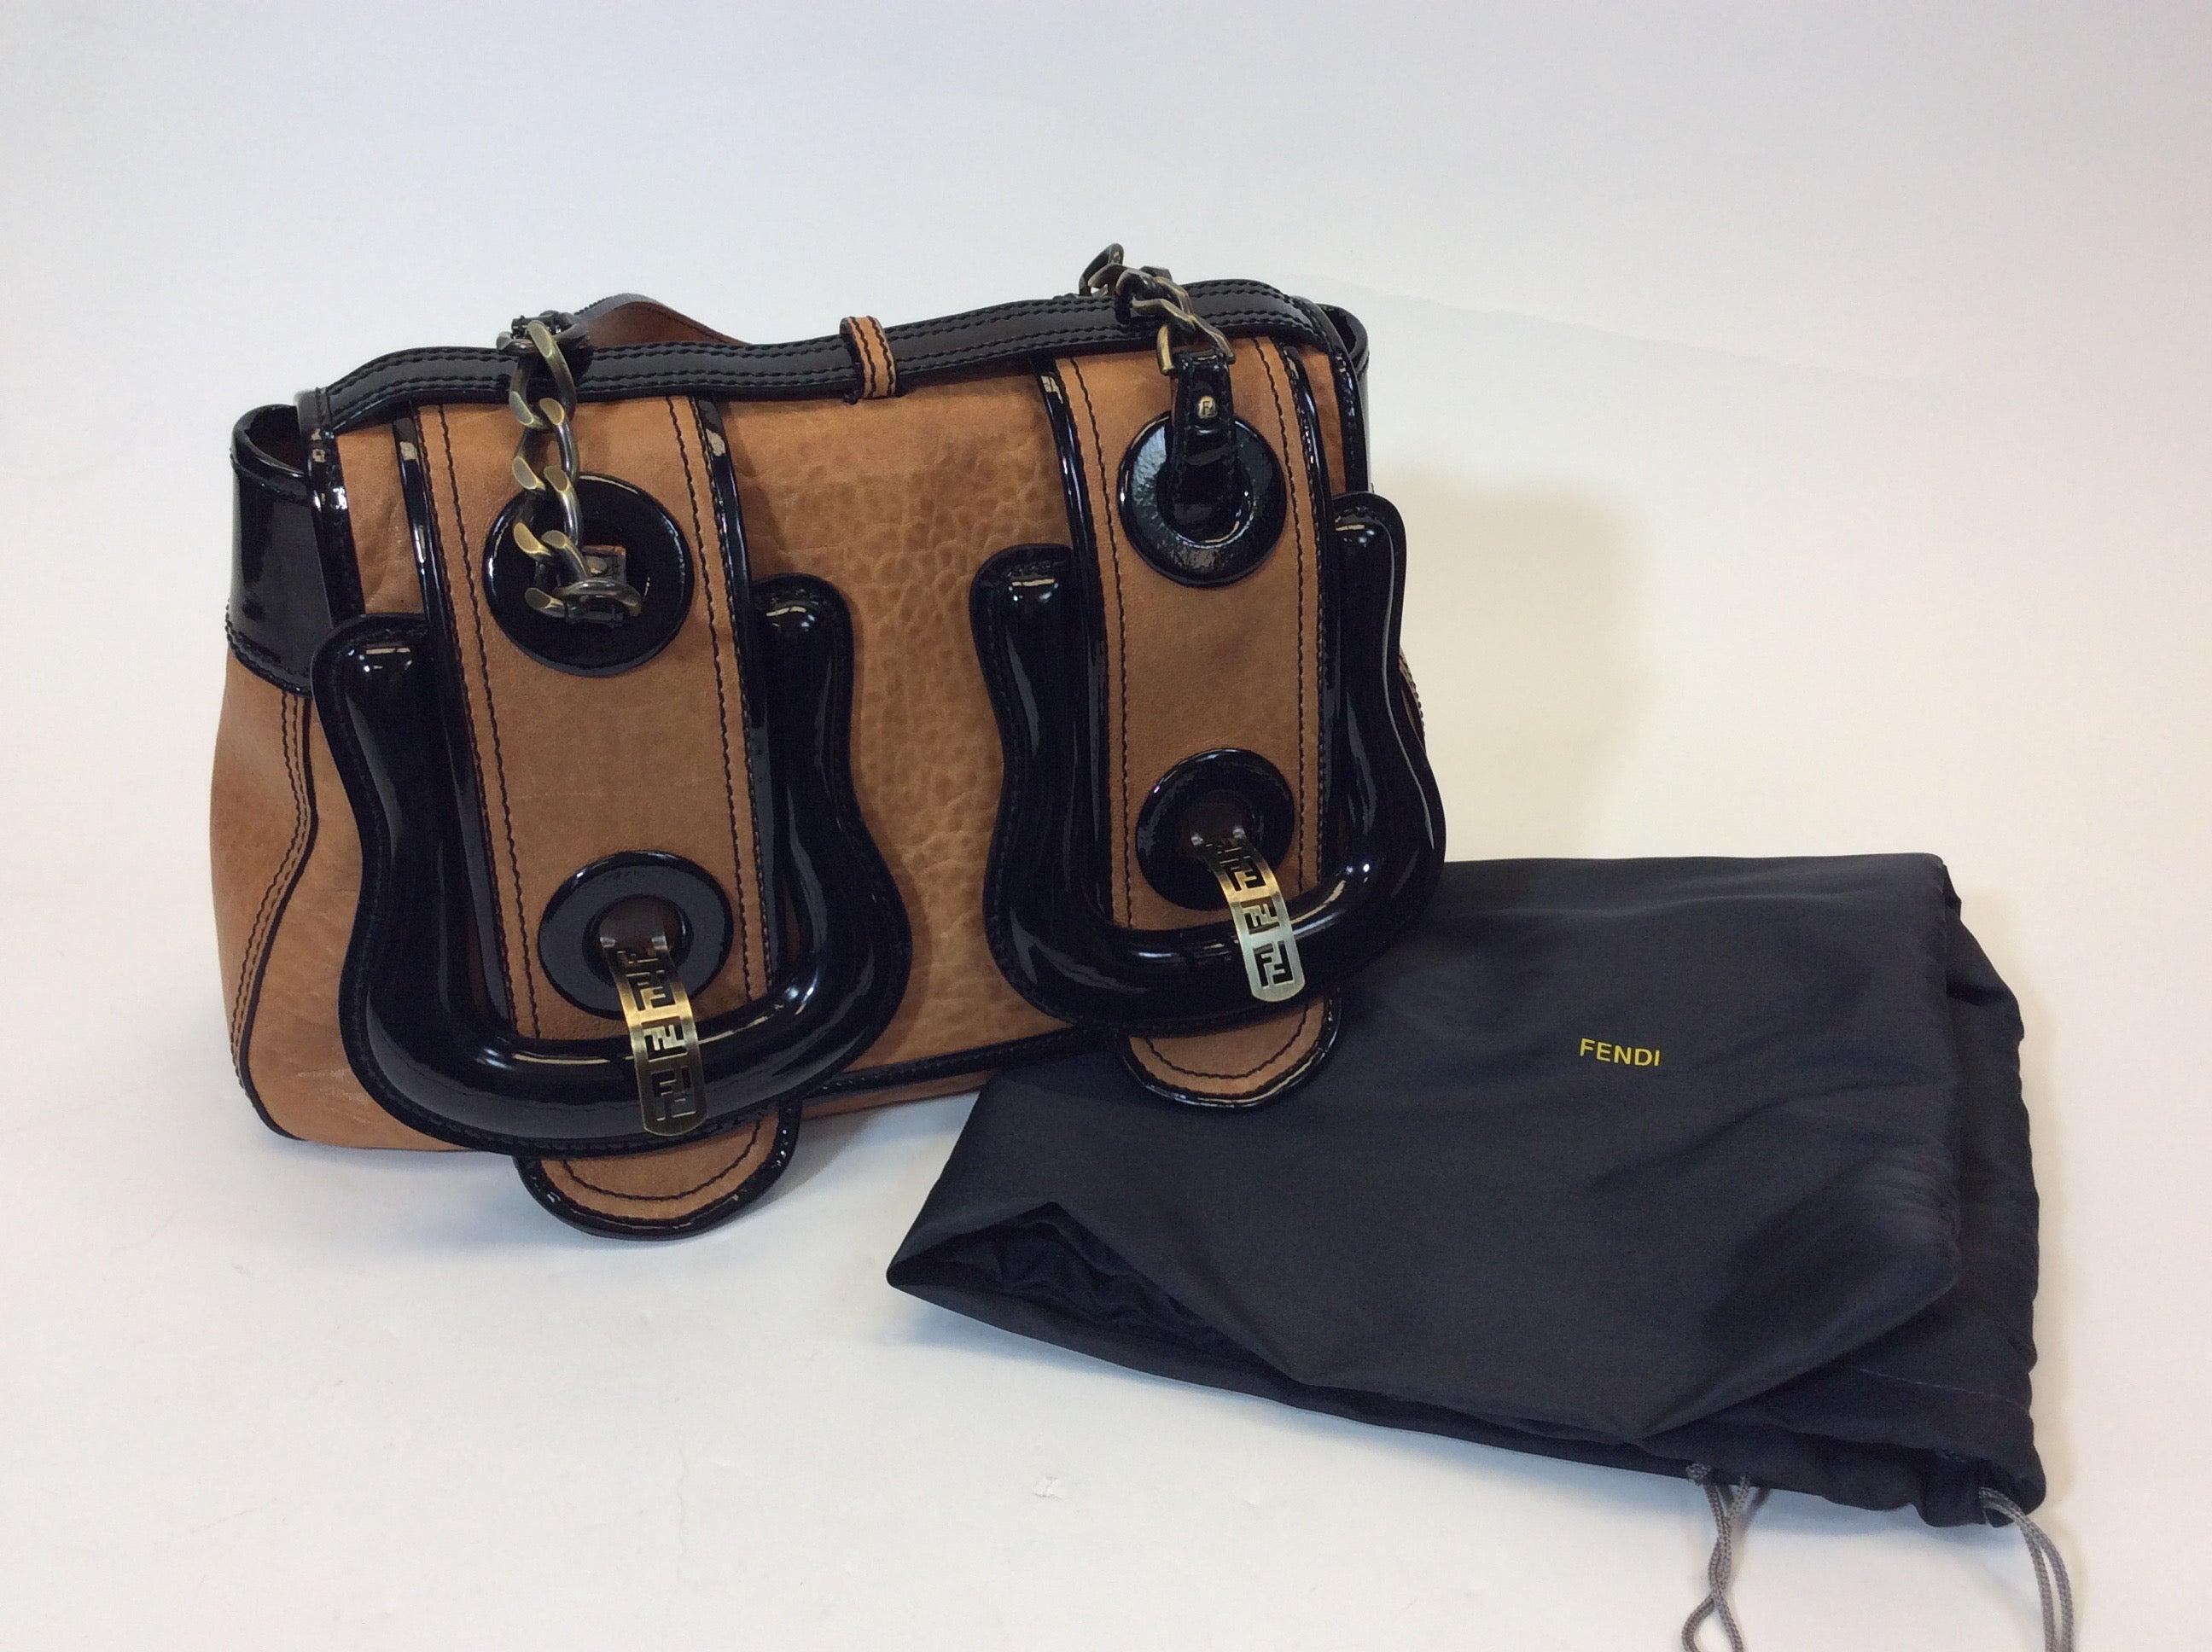 d23e9639e7 Fendi Black Patent and Brown Leather B Buckle Bursa Shoulder Bag For Sale  at 1stdibs